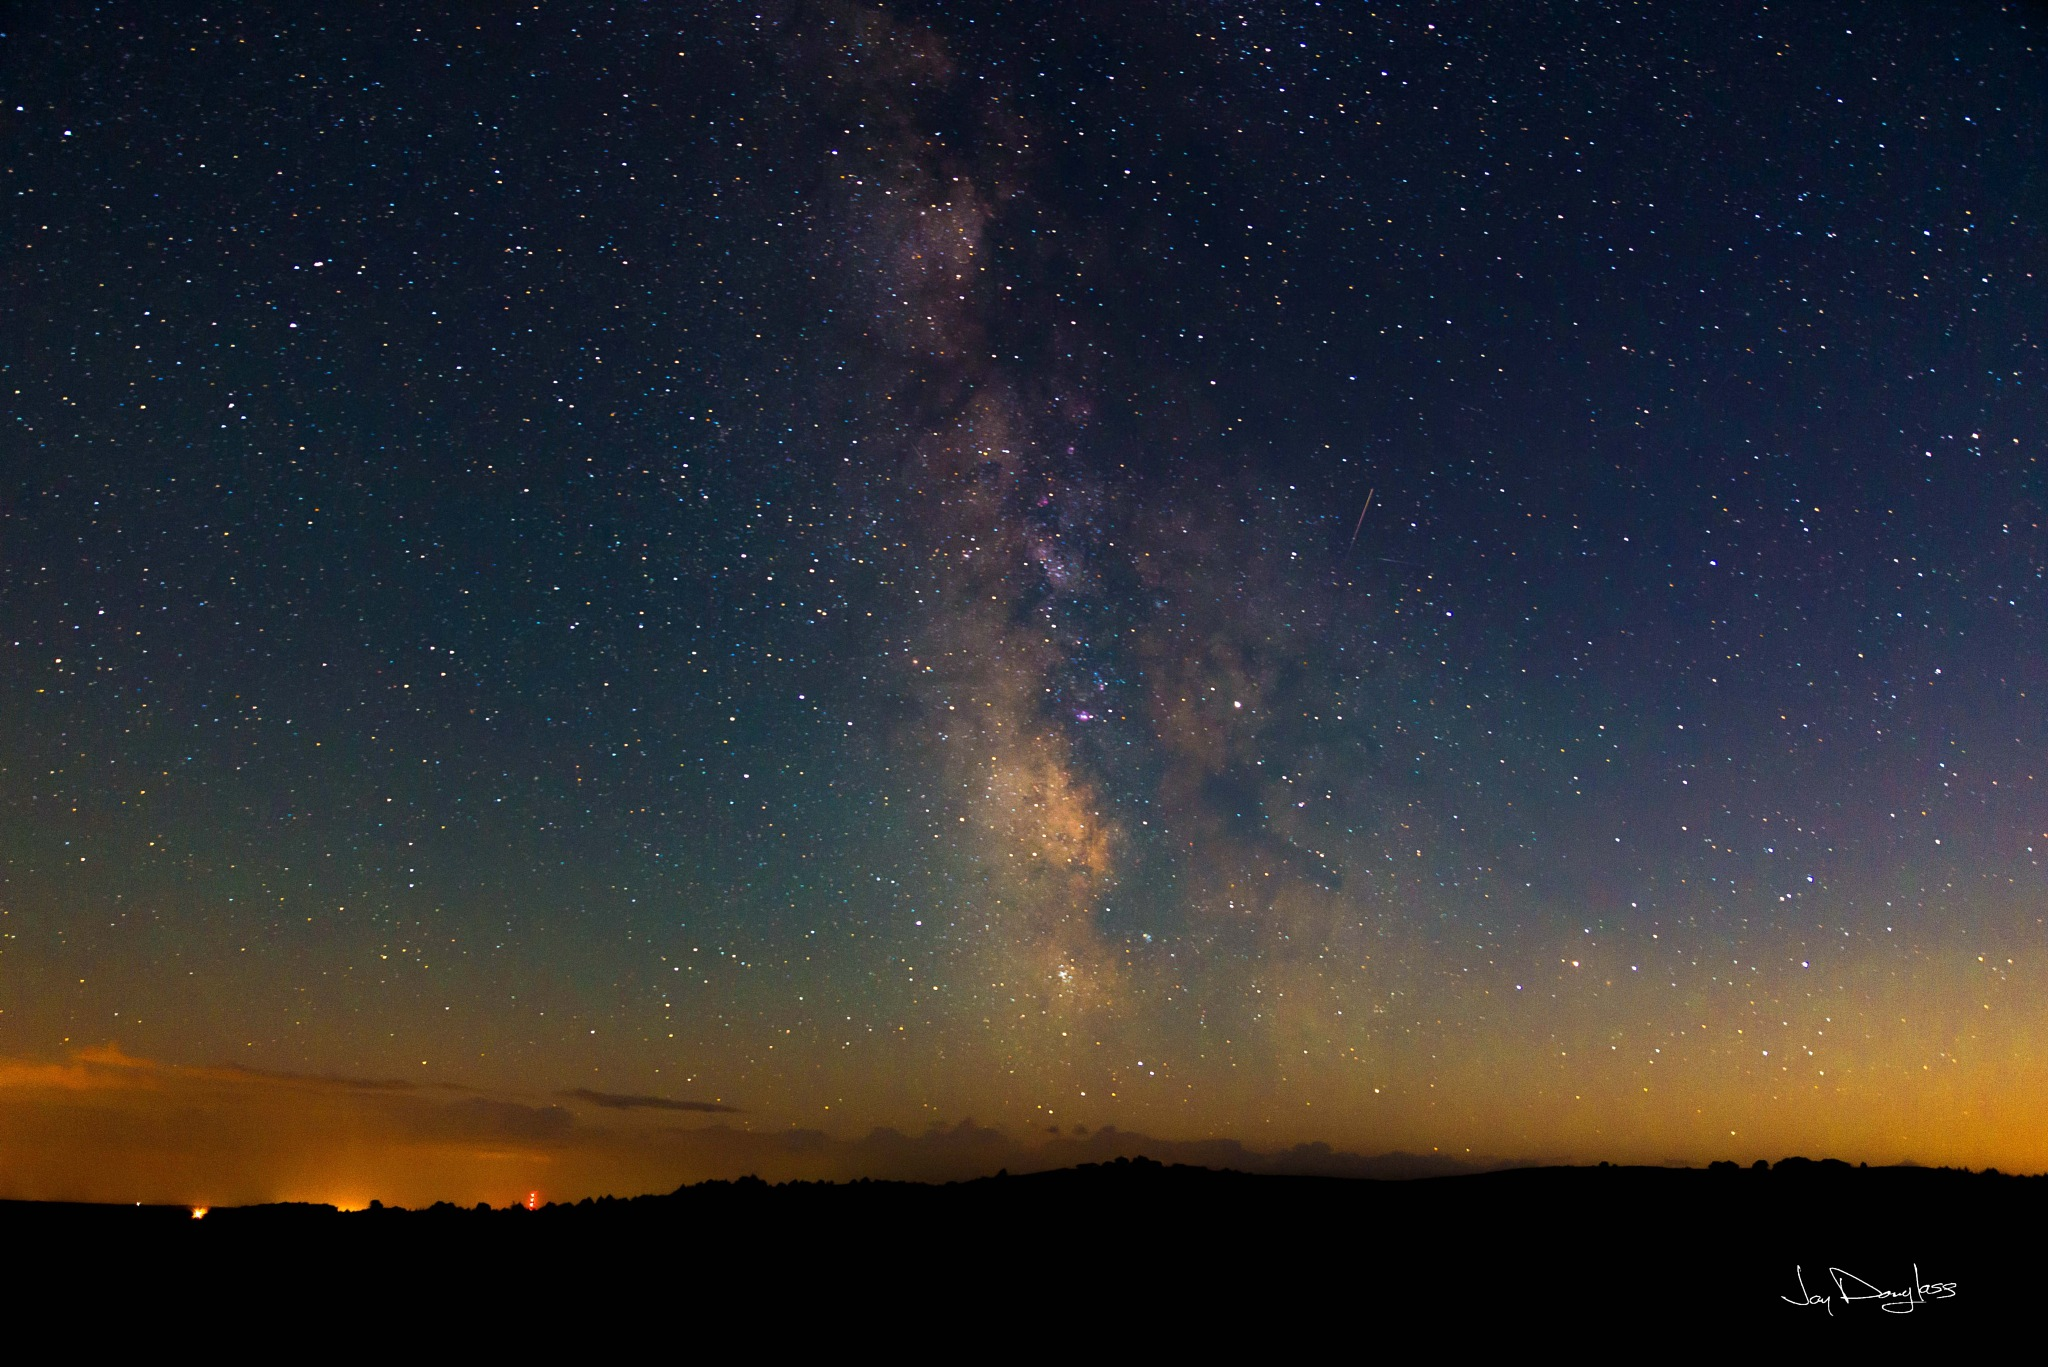 Milky Way by Jay Douglass